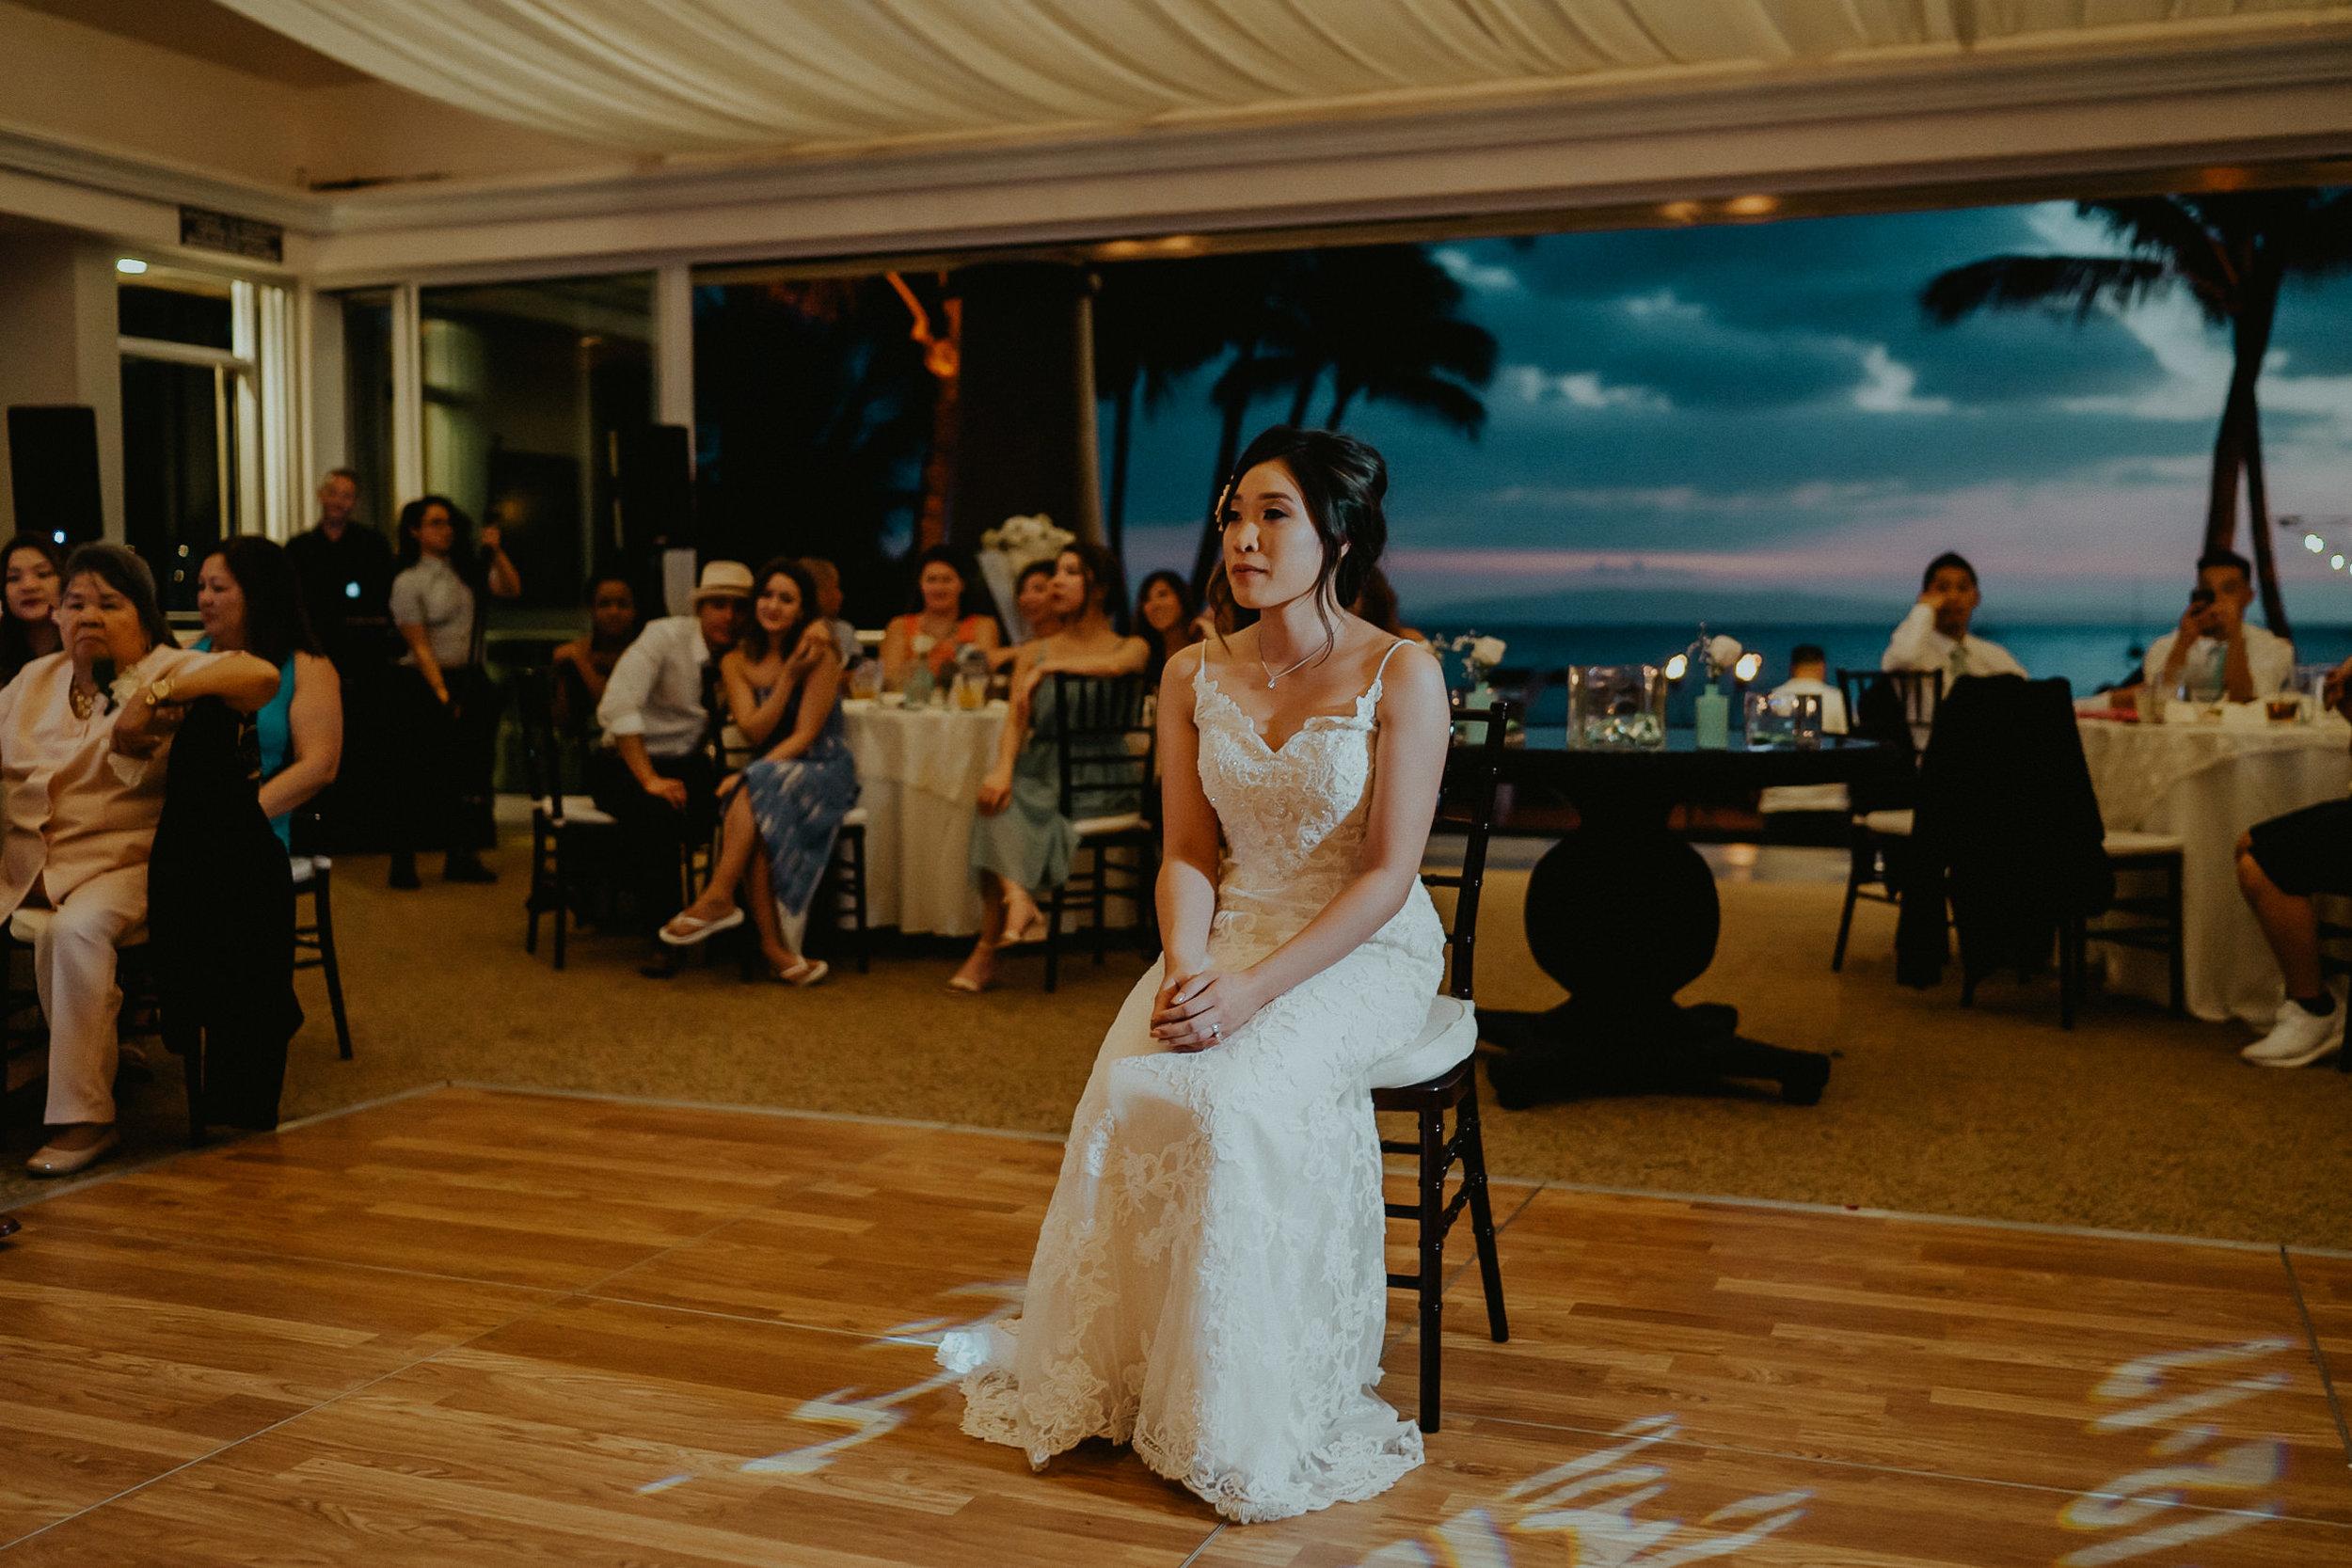 Maui_Destination_wedding_Alfred_Tang-69.jpg